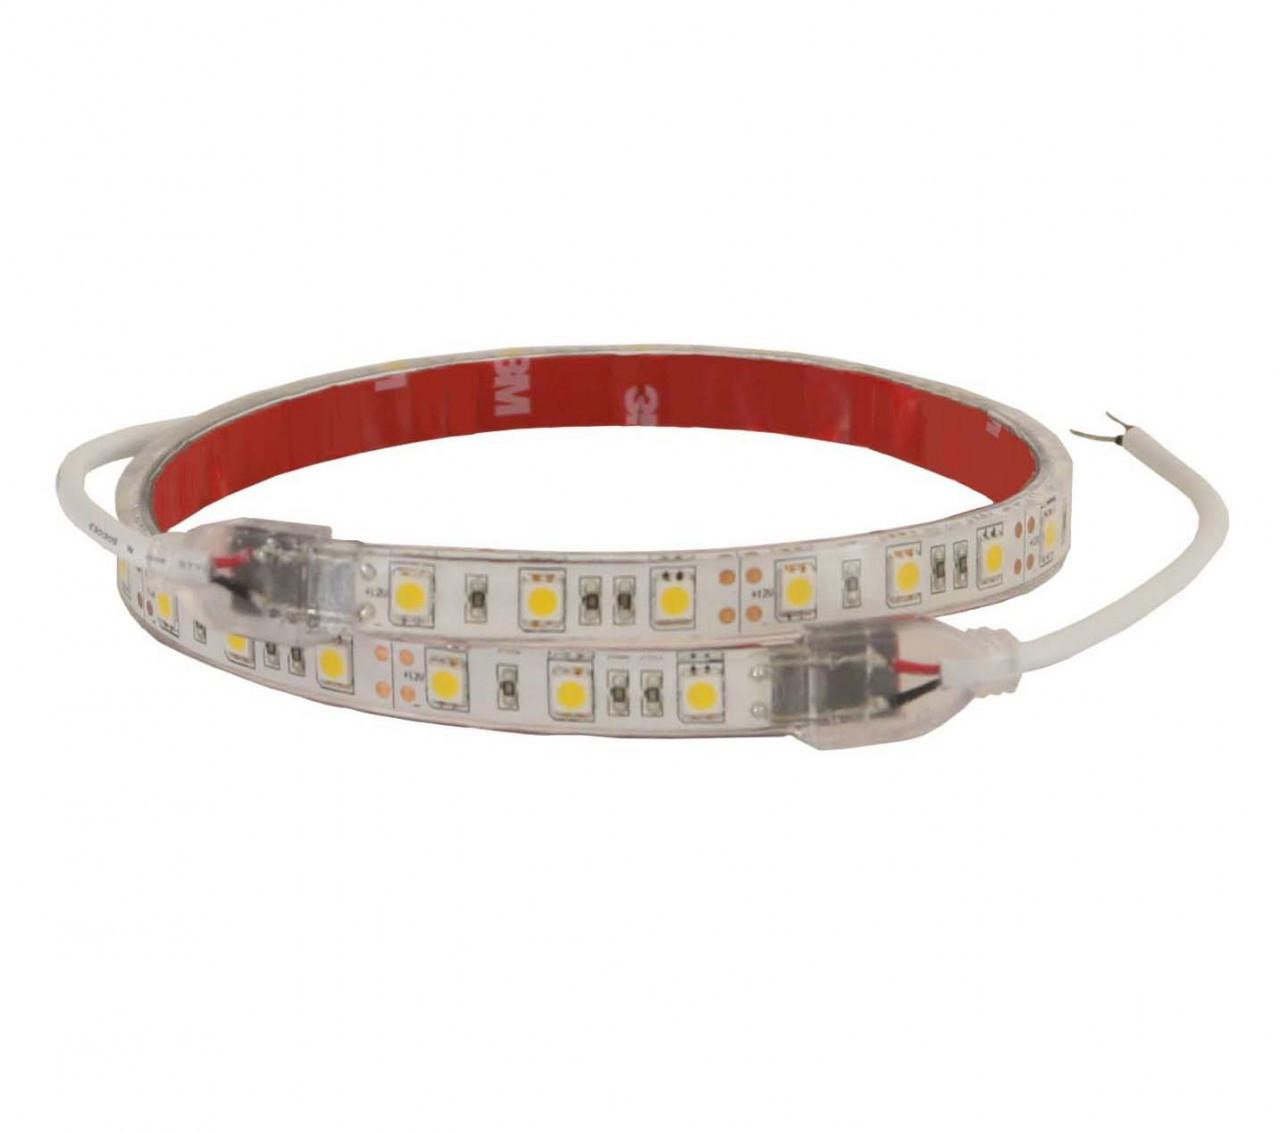 LED48C72 --- LED Light Strip - 72 Clear Diodes